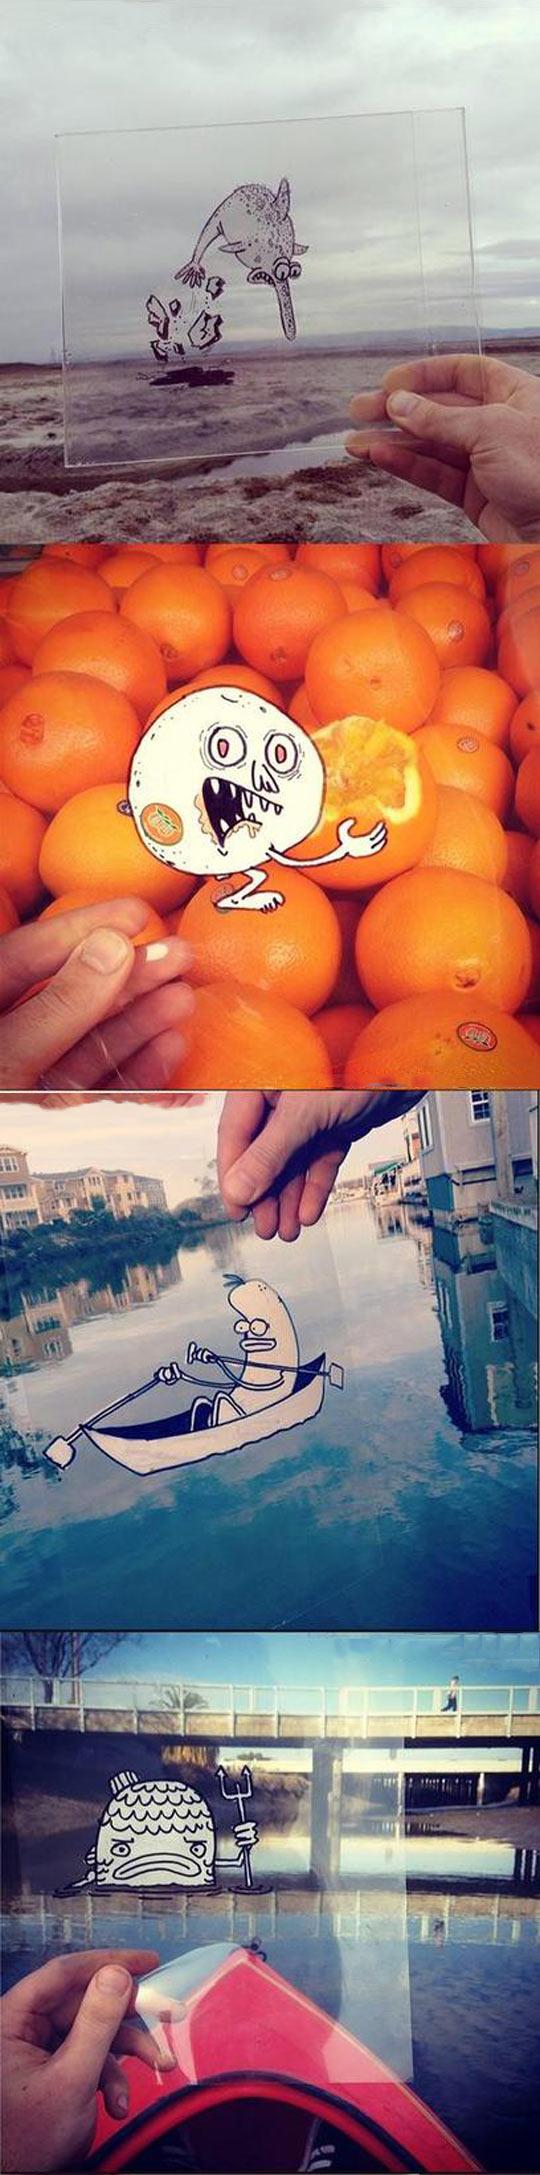 Cartoon Doodles in real life...